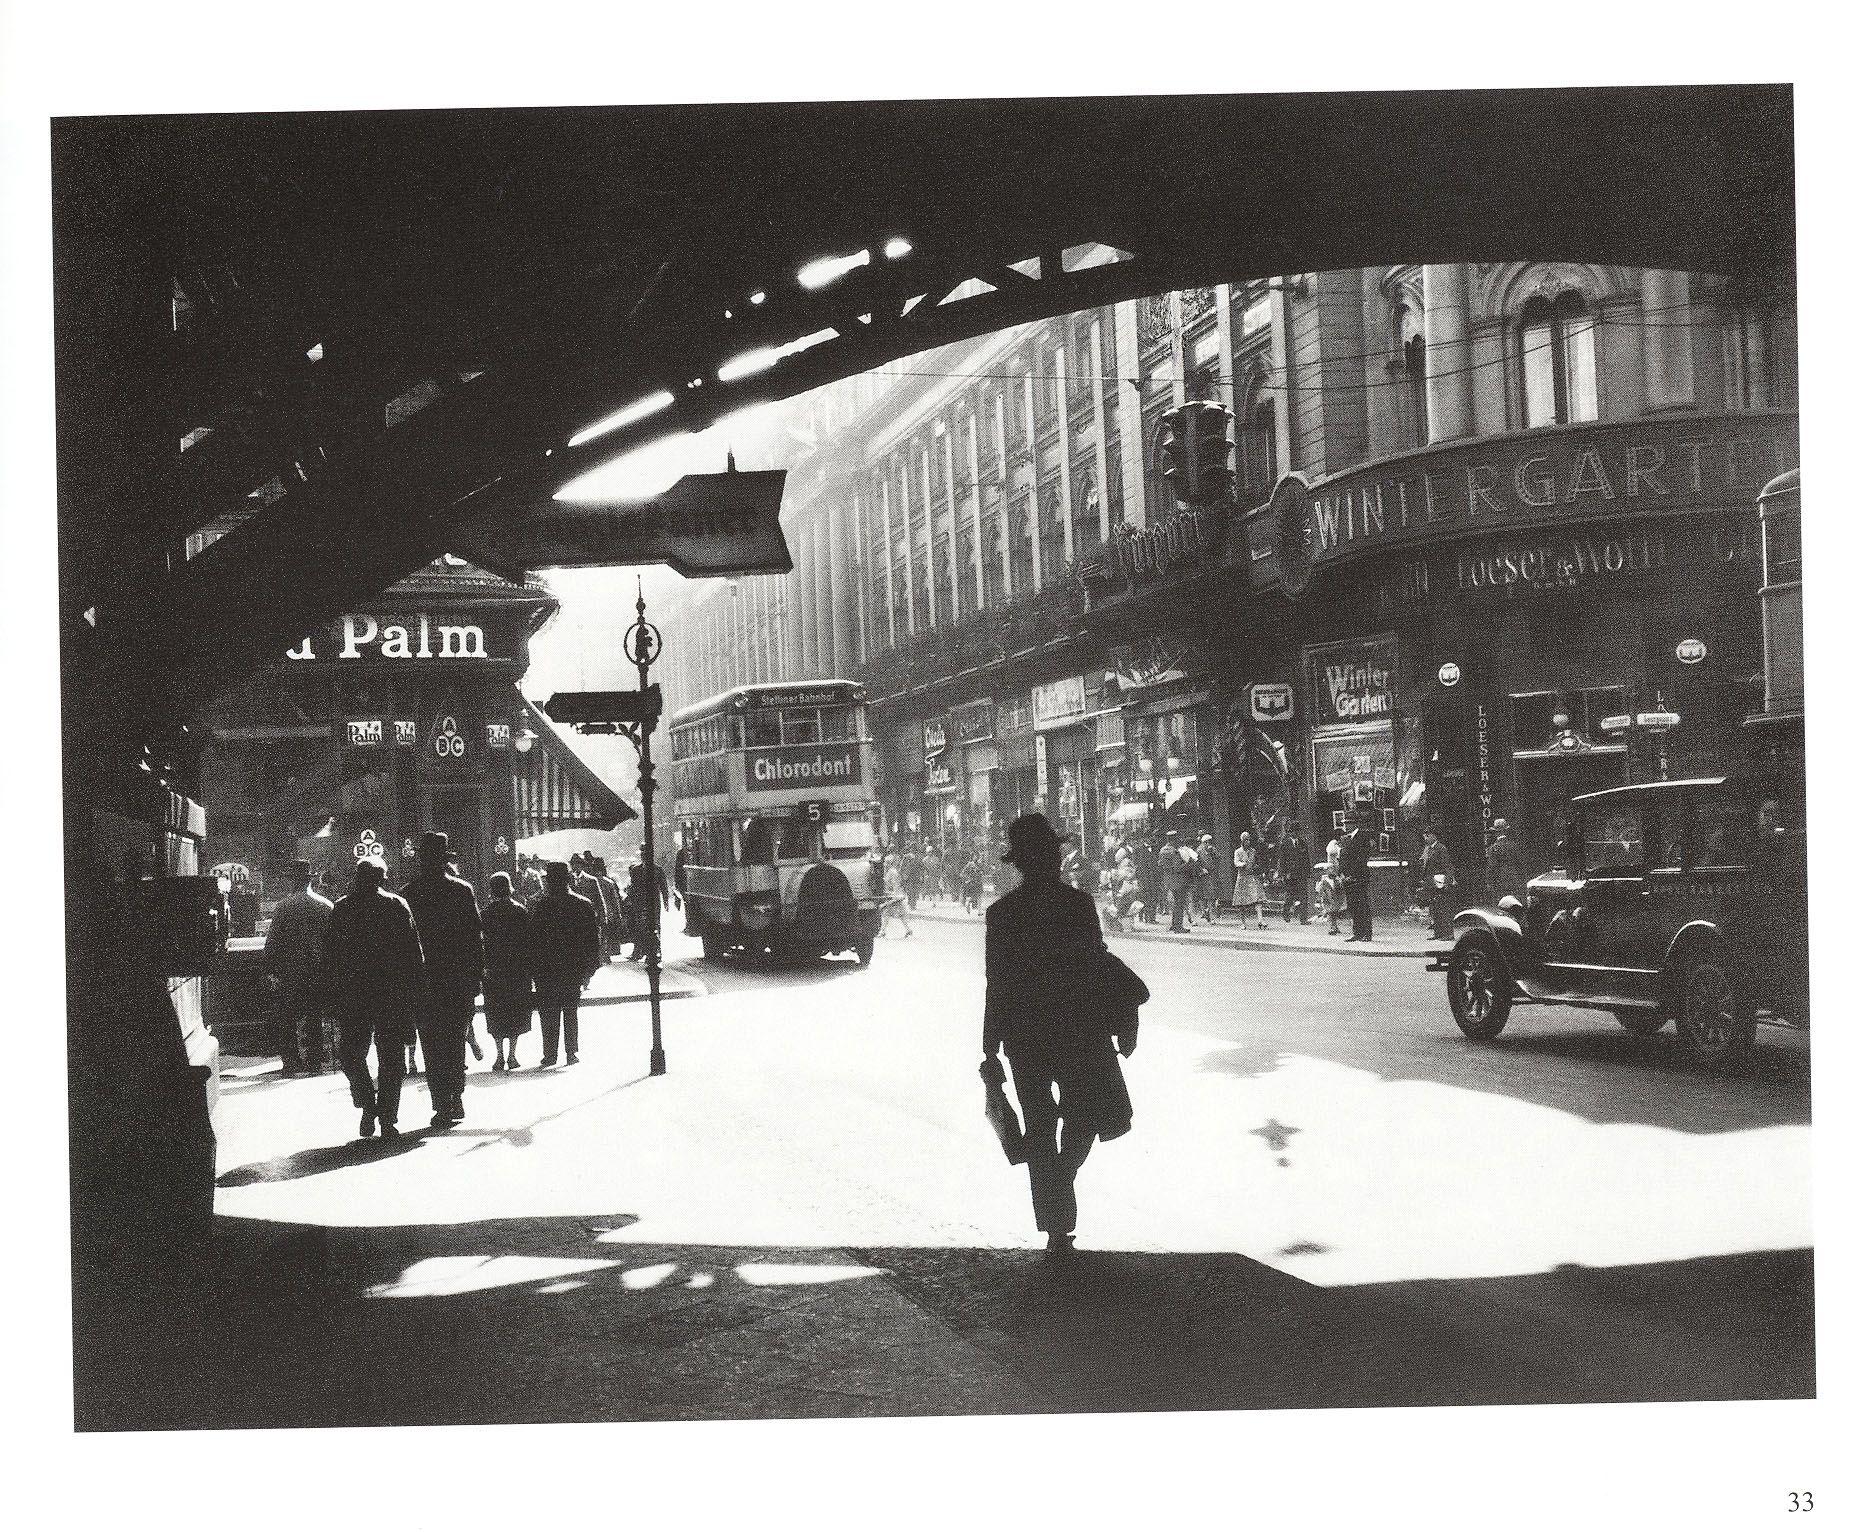 Unter Dem Bahnhof Friedrichstrasse Berlin 1930 O P Friedrichstrasse Berlin Historische Fotos